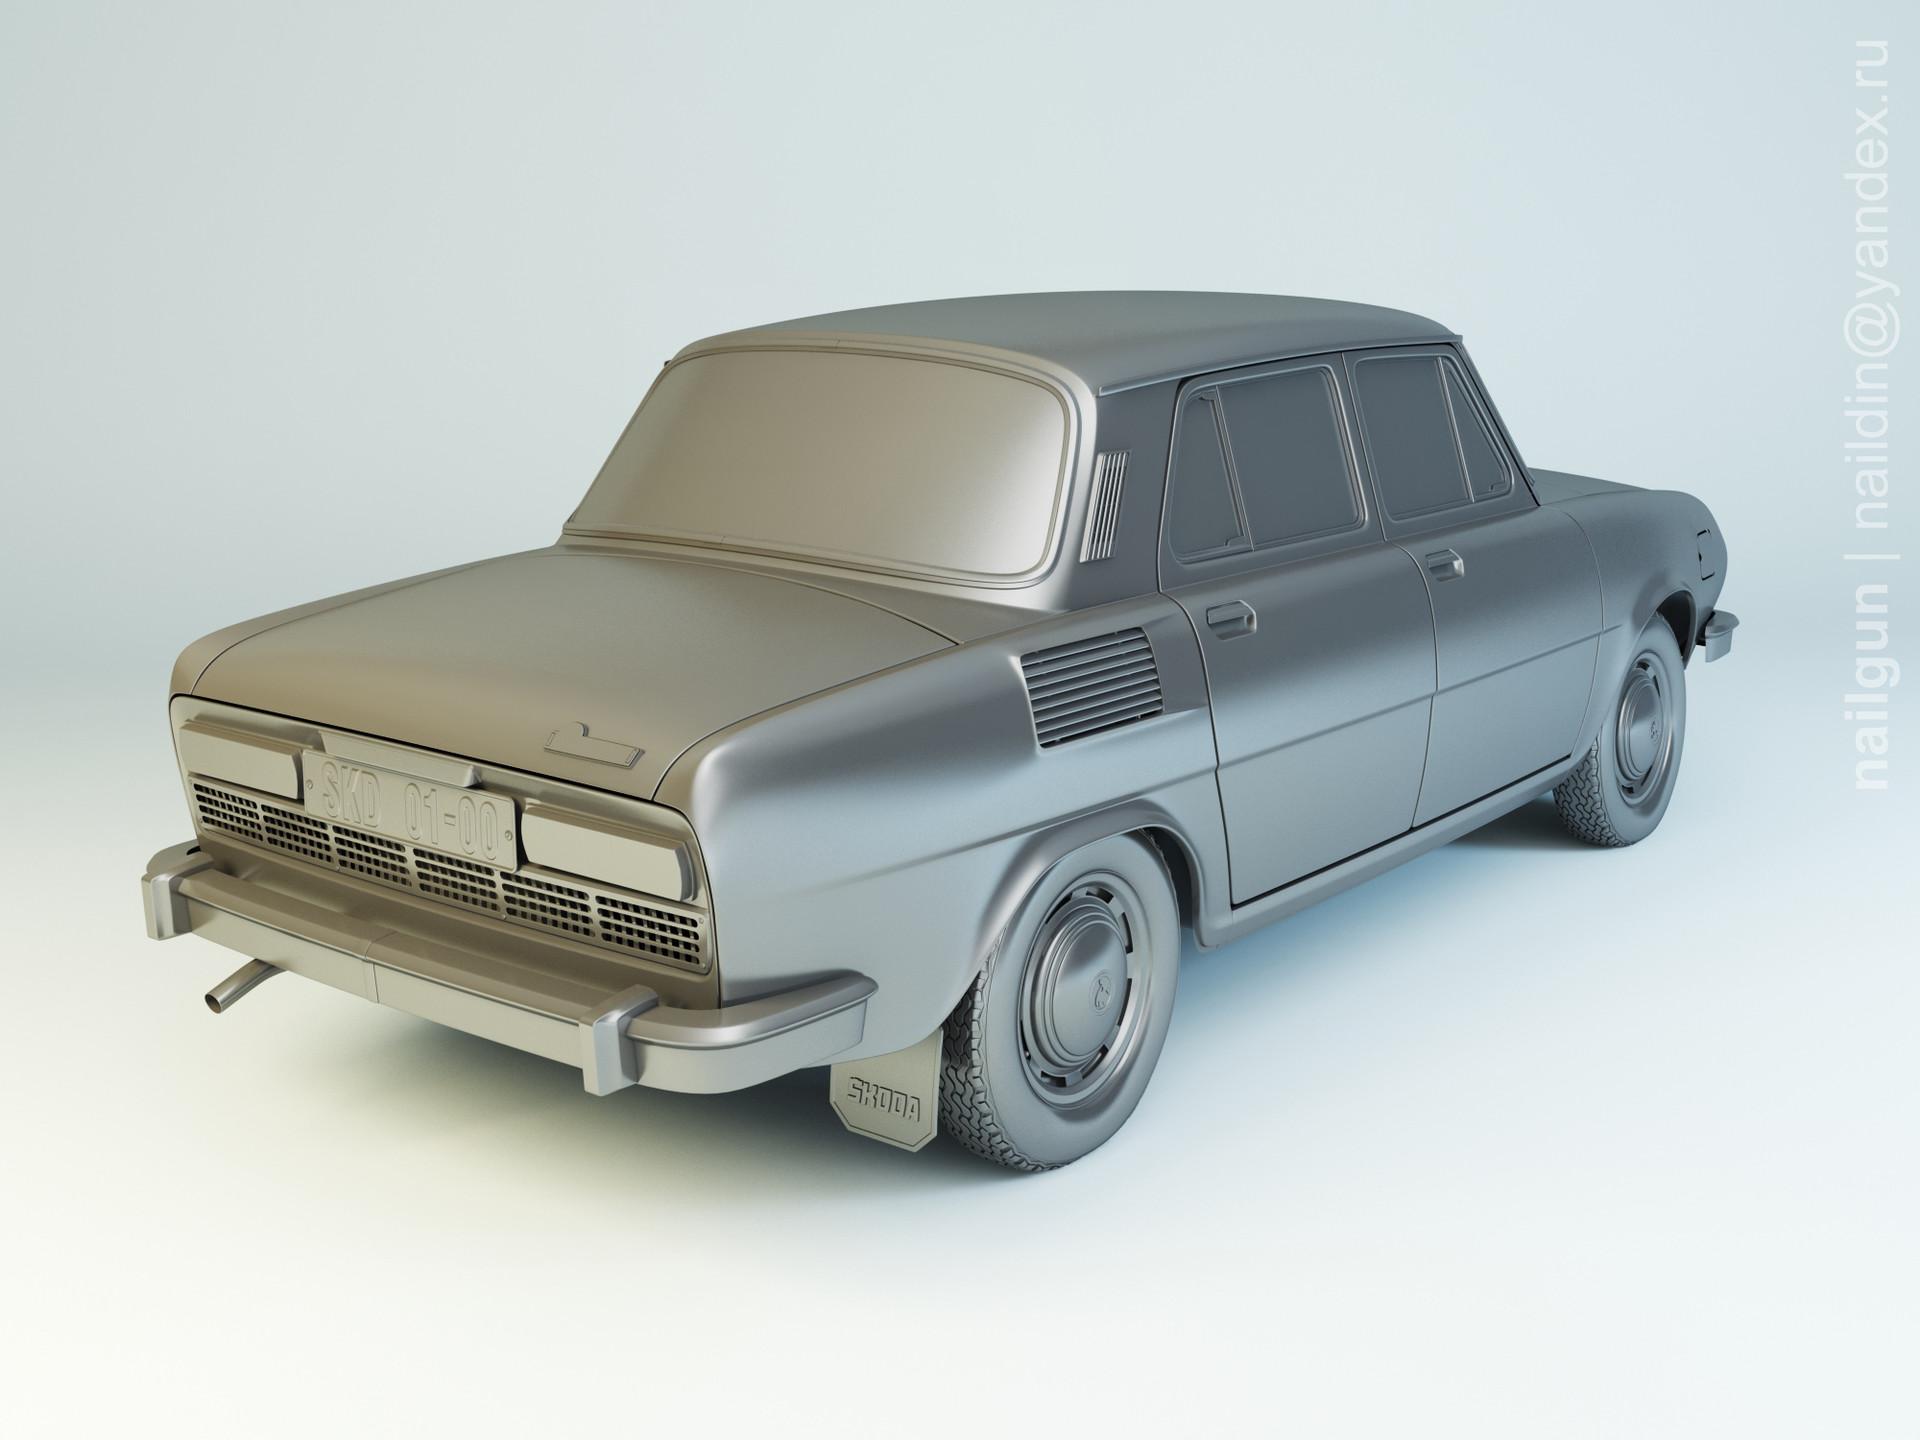 Nail khusnutdinov als 188 002 skoda 100 modelling 1